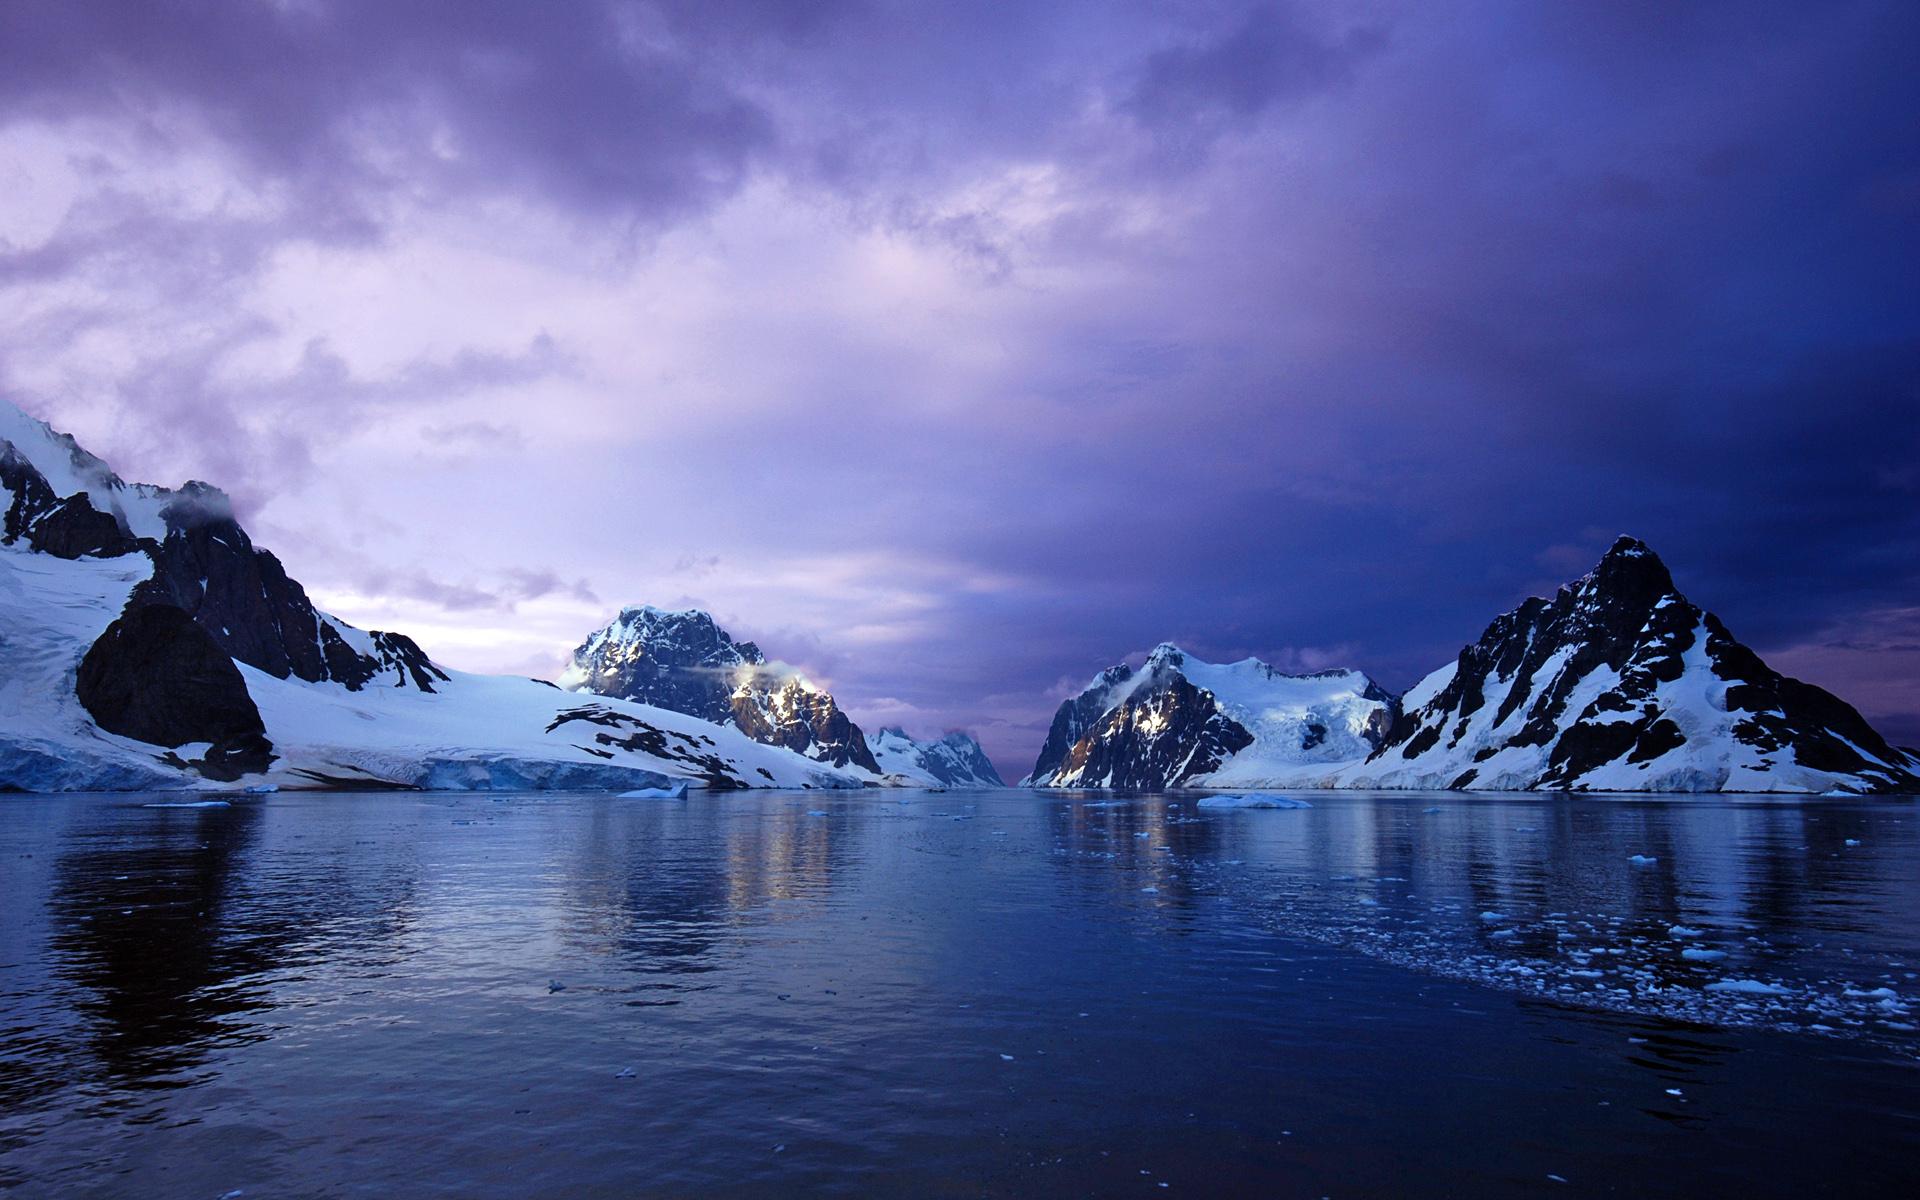 Stunning Antarctica Wallpaper 28862 1920x1200 Px